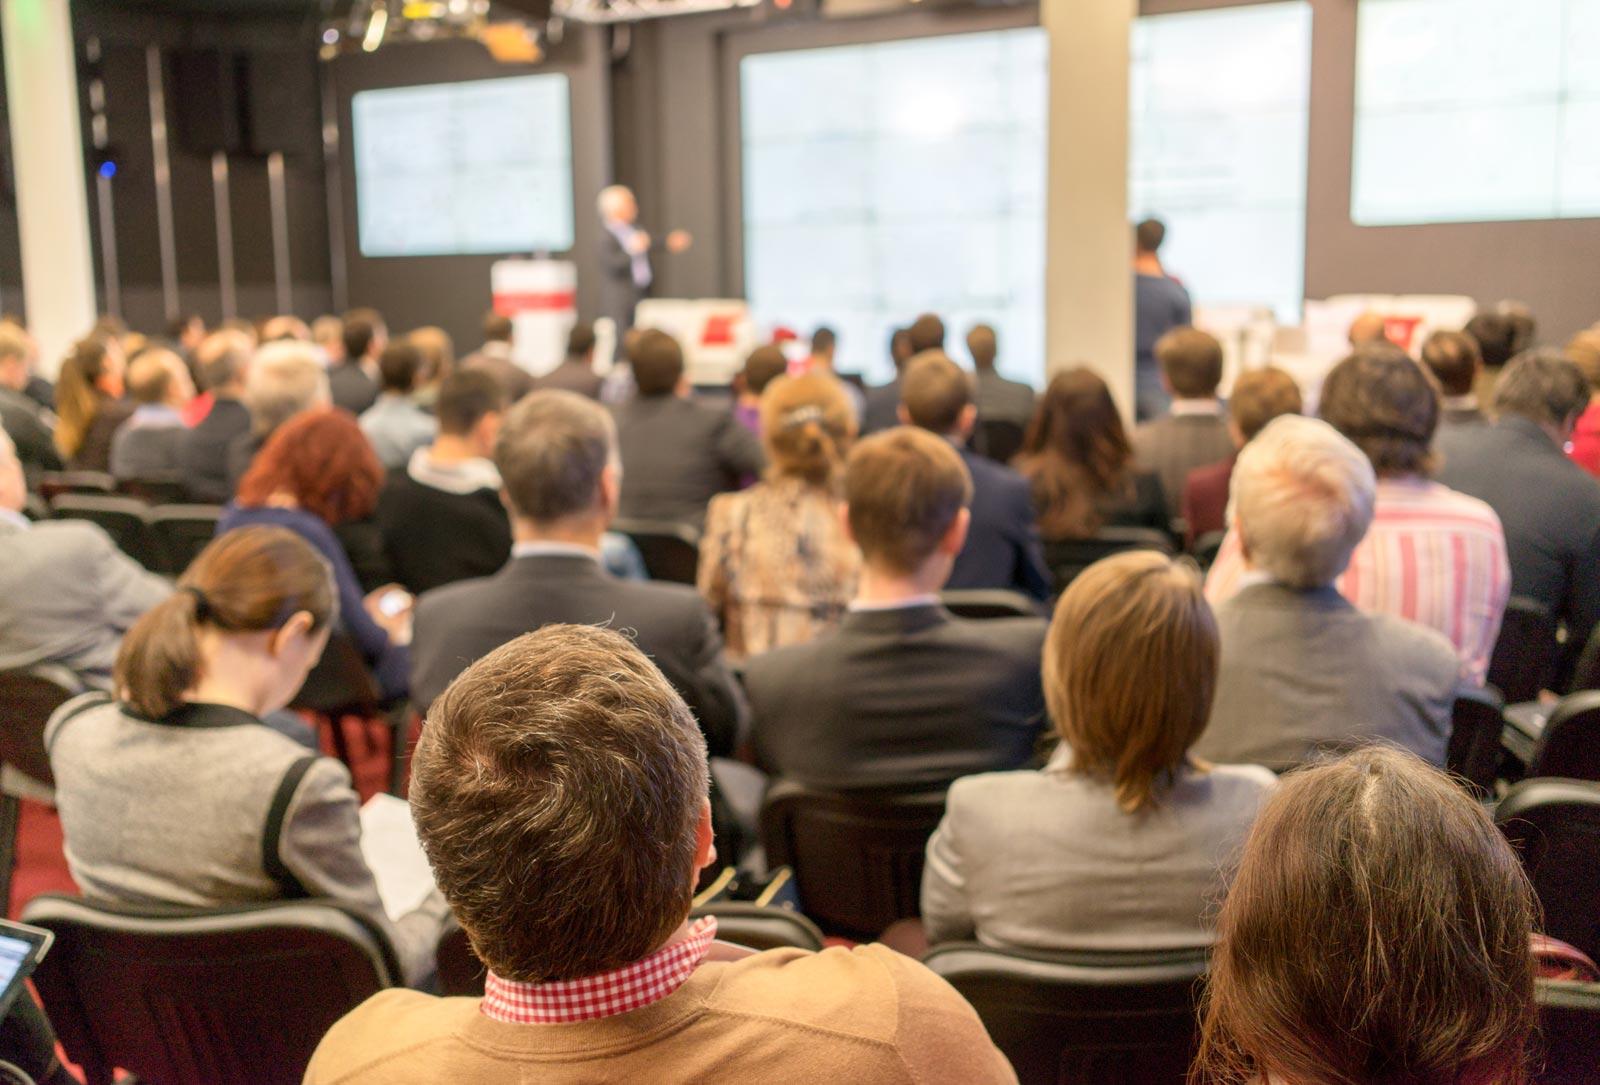 IN<em>tem</em>® nimmt am Führungskongress Rhein-Neckar teil